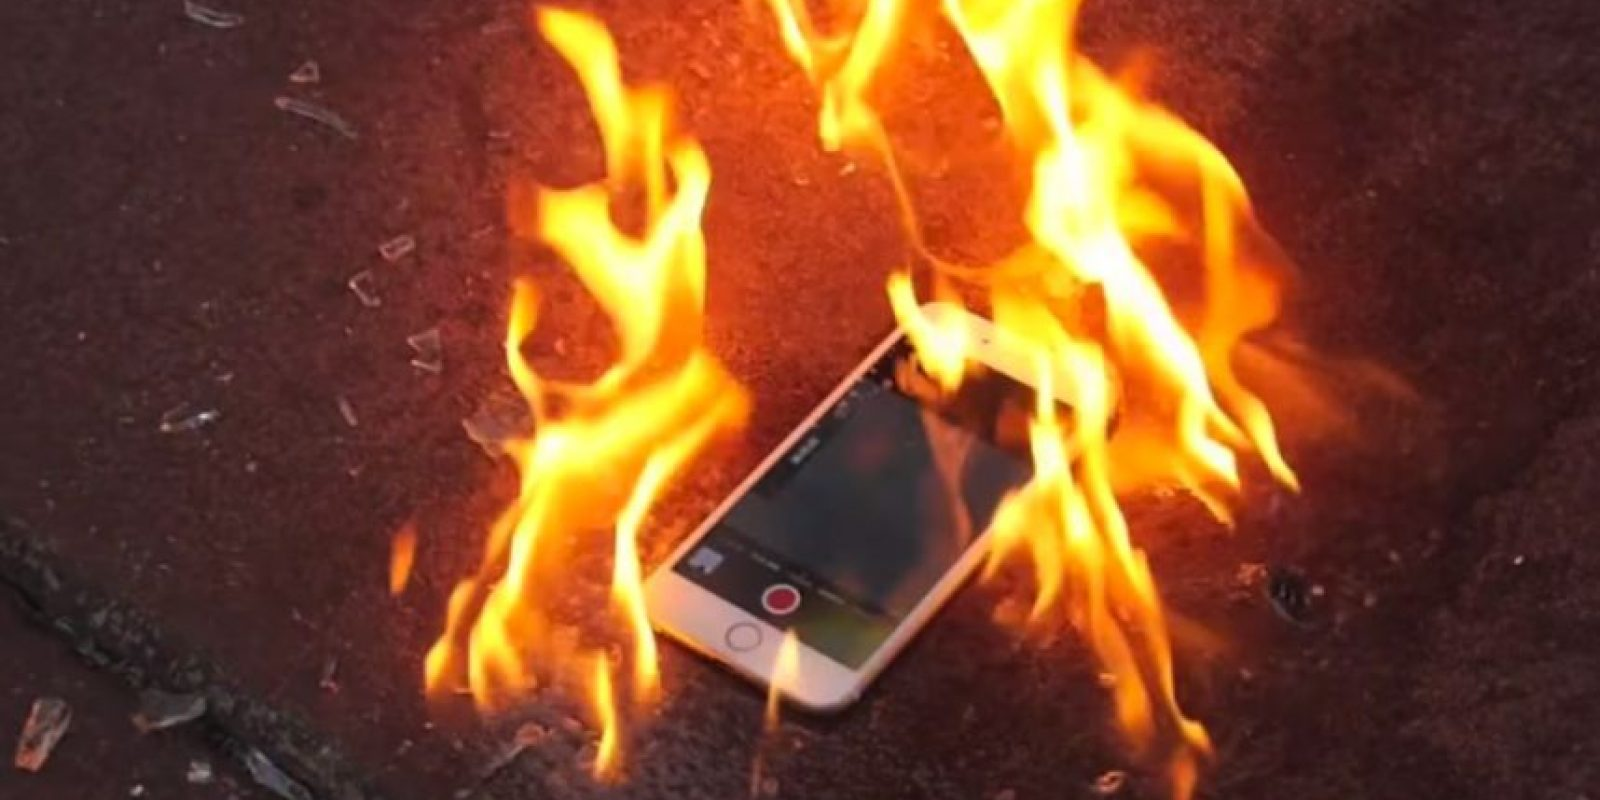 Incendiado Foto:YouTube/TechRax